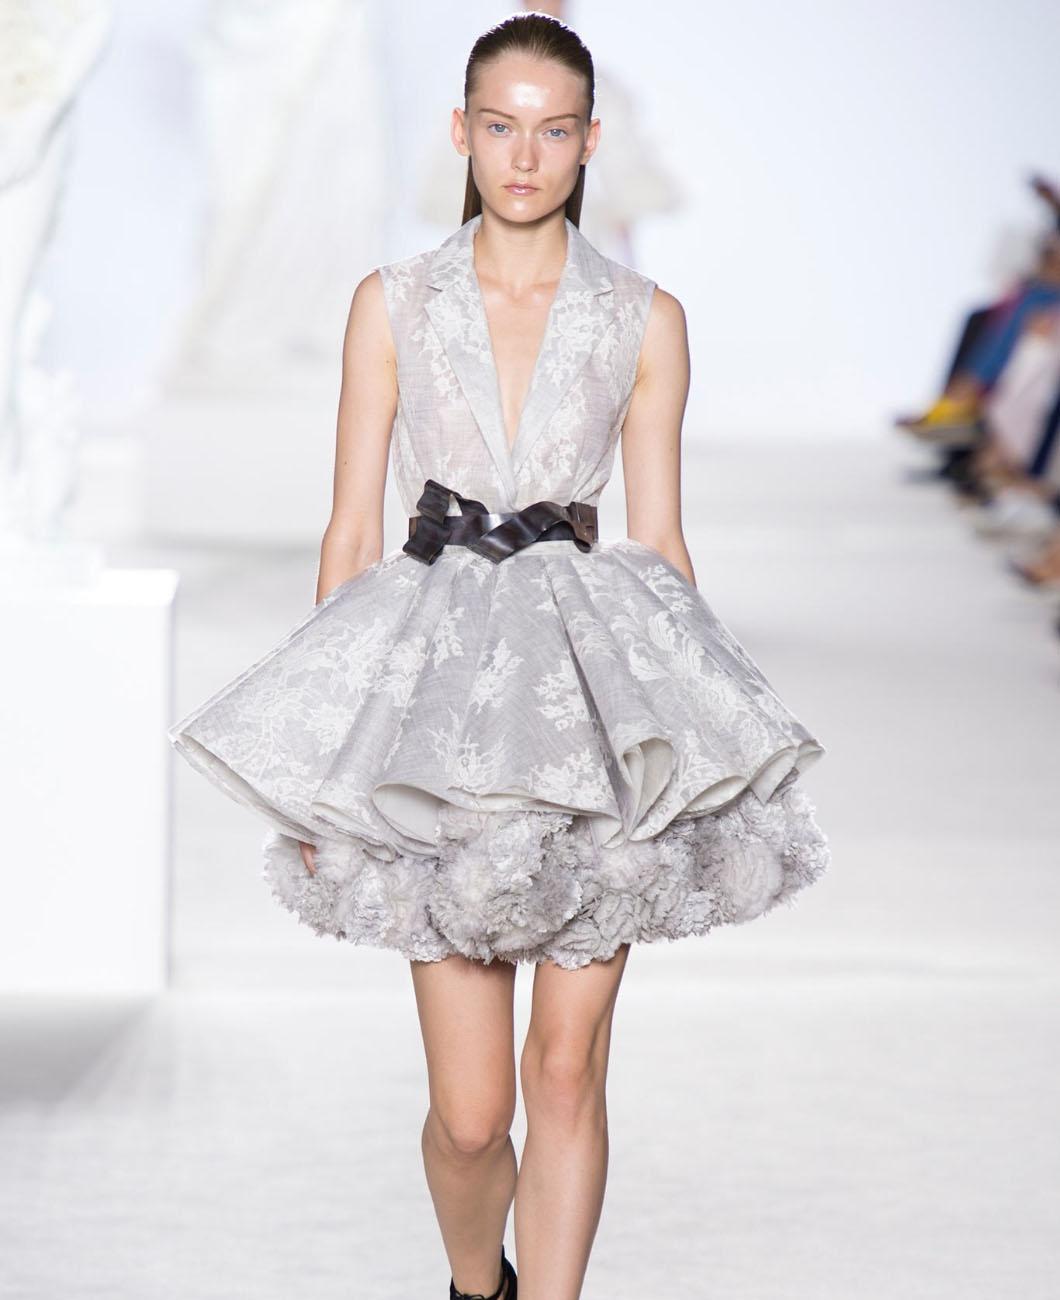 peplum-latest-trend-one-piece-la-polo-lapolo-fashion-drape